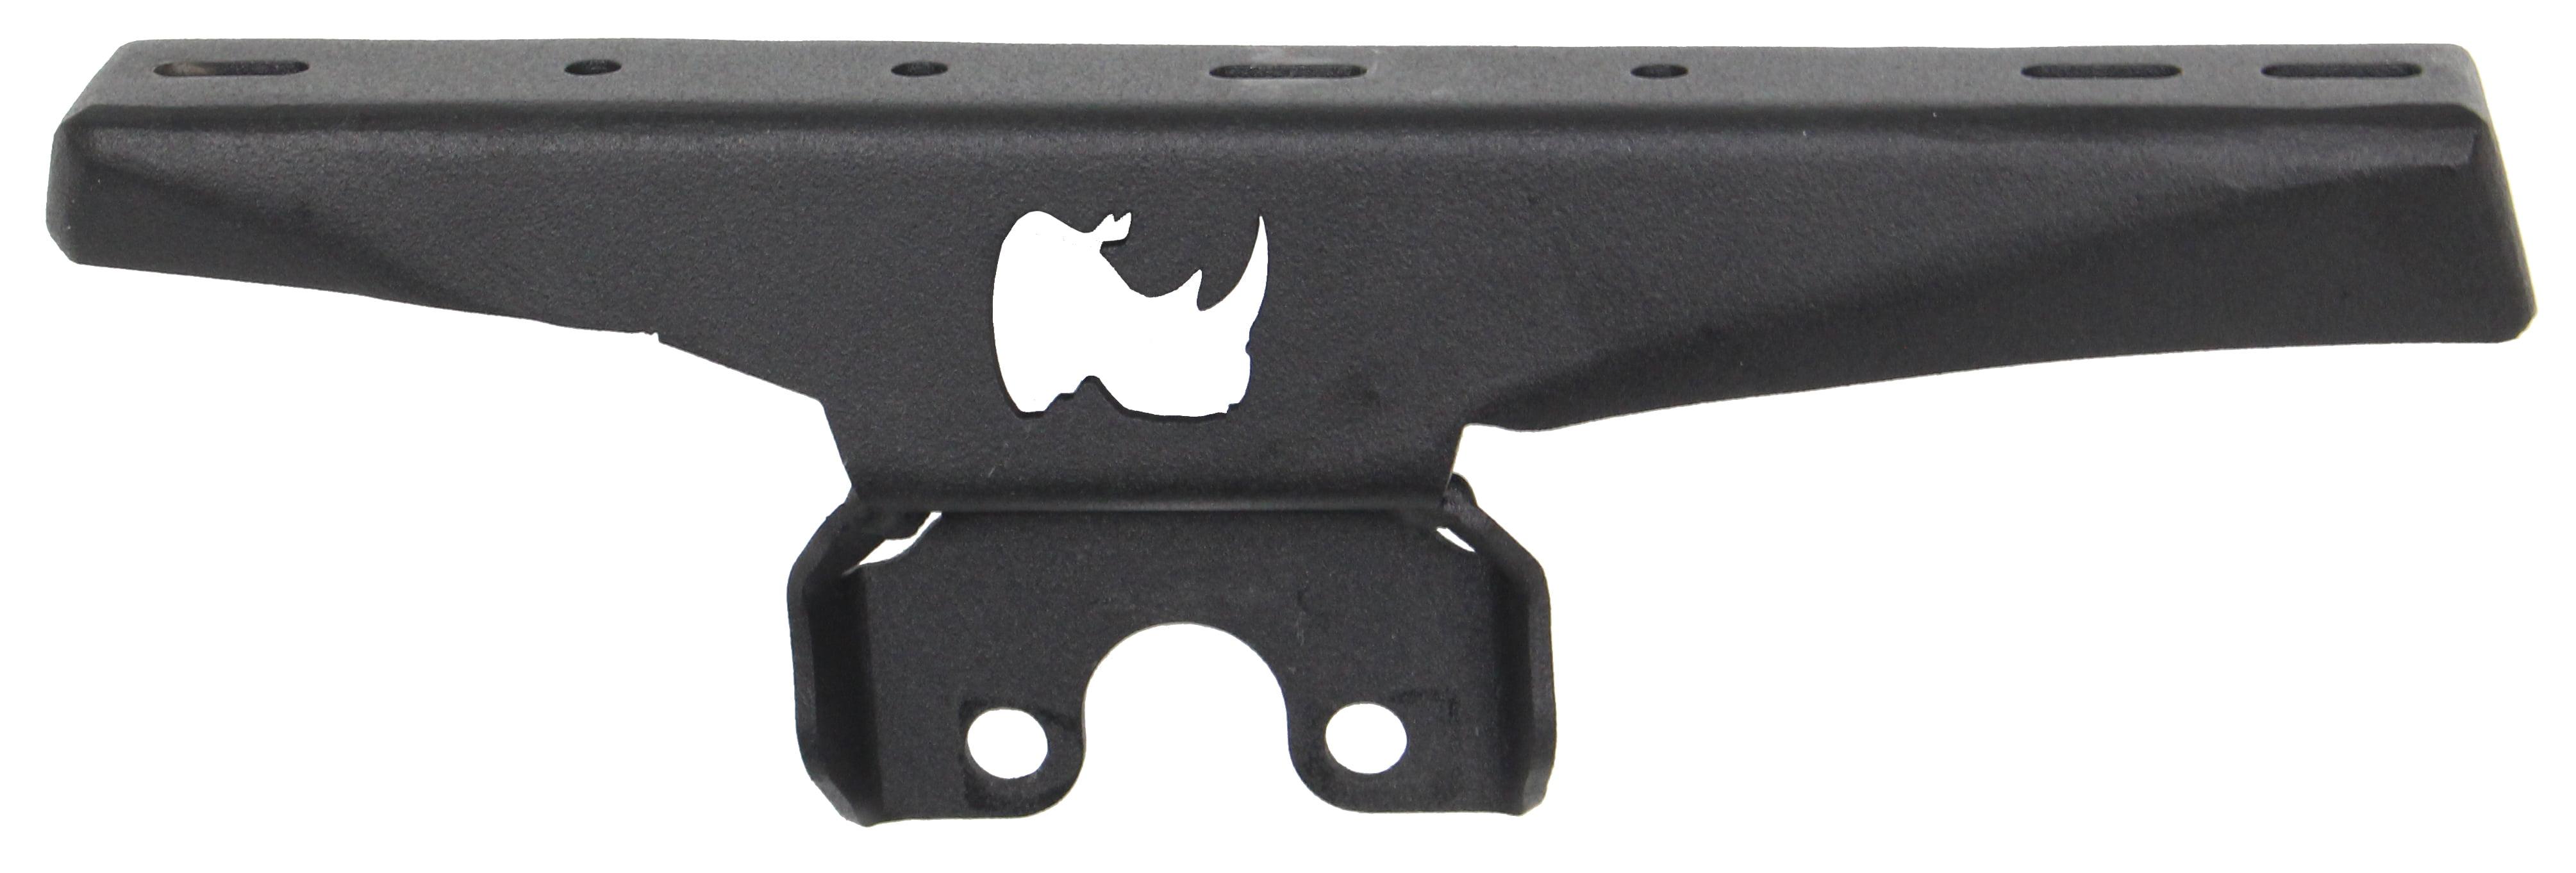 Go Rhino 599501T Light Bar Mounting Kit Rear Window Hard Top Mount